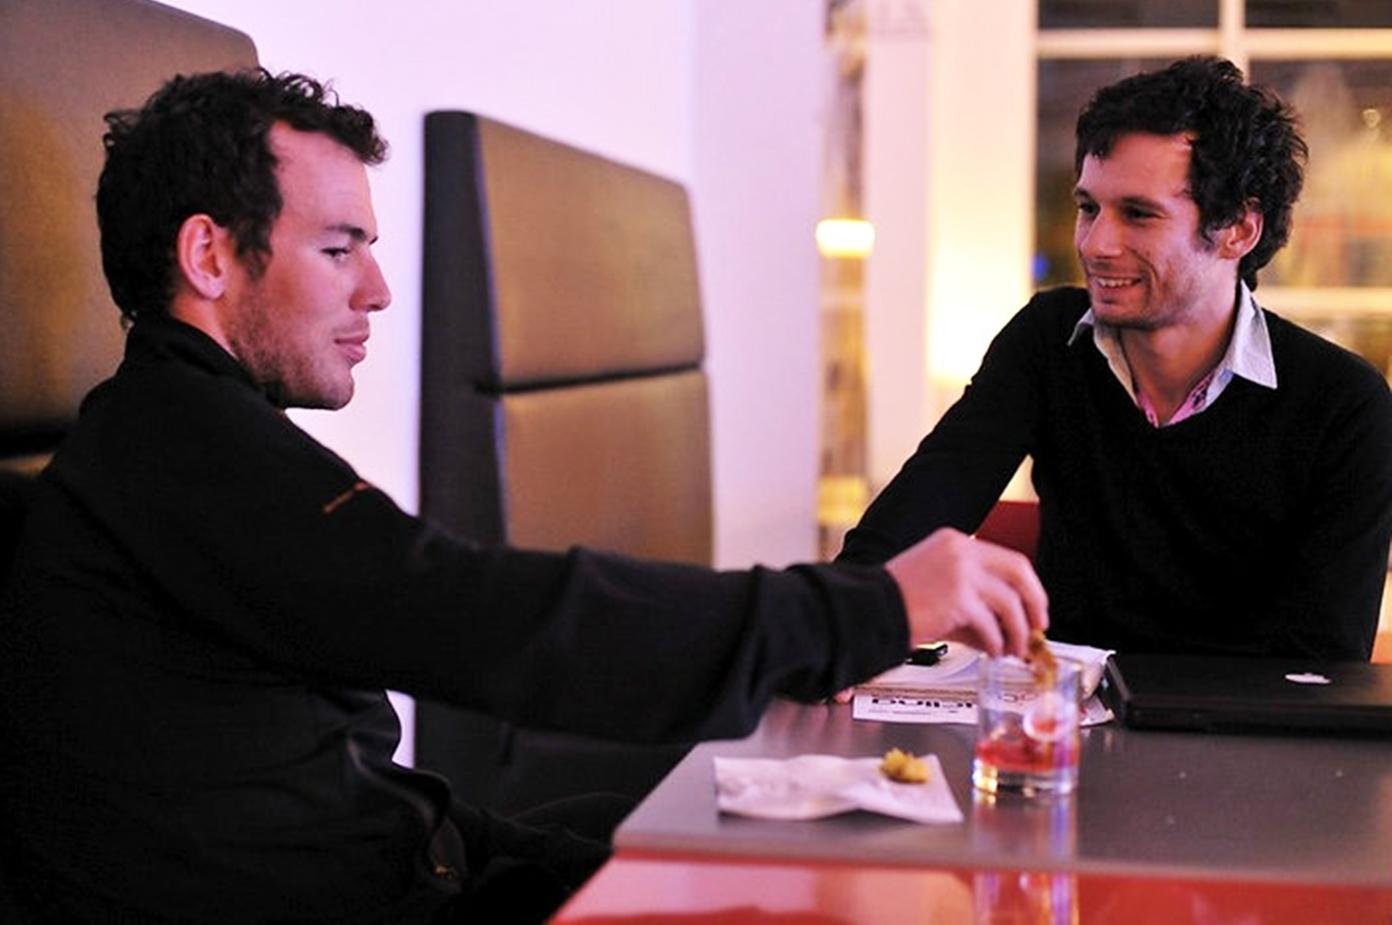 Mark Cavendish chats to Daniel Friebe in Palma, Mallorca